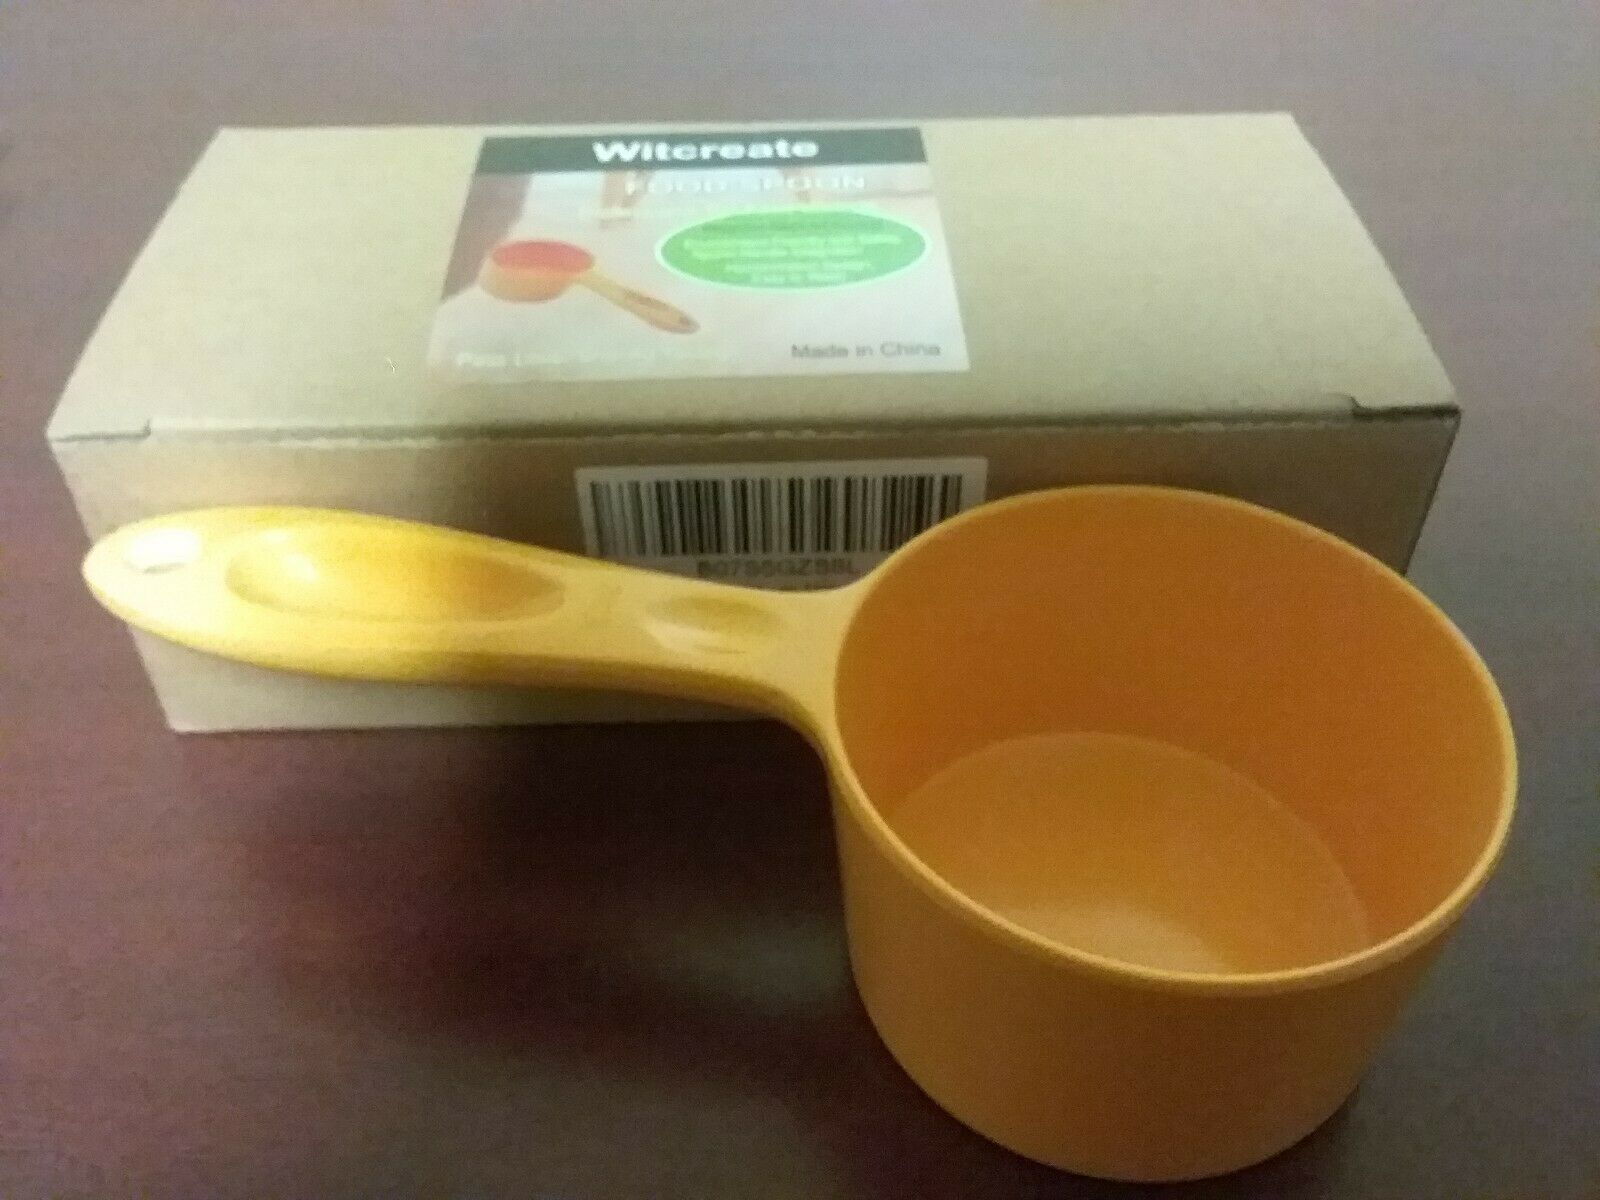 Witcreate Pet Supplies  Professional Pet Food Scoop Spoon 200ml  Yellow Melamine